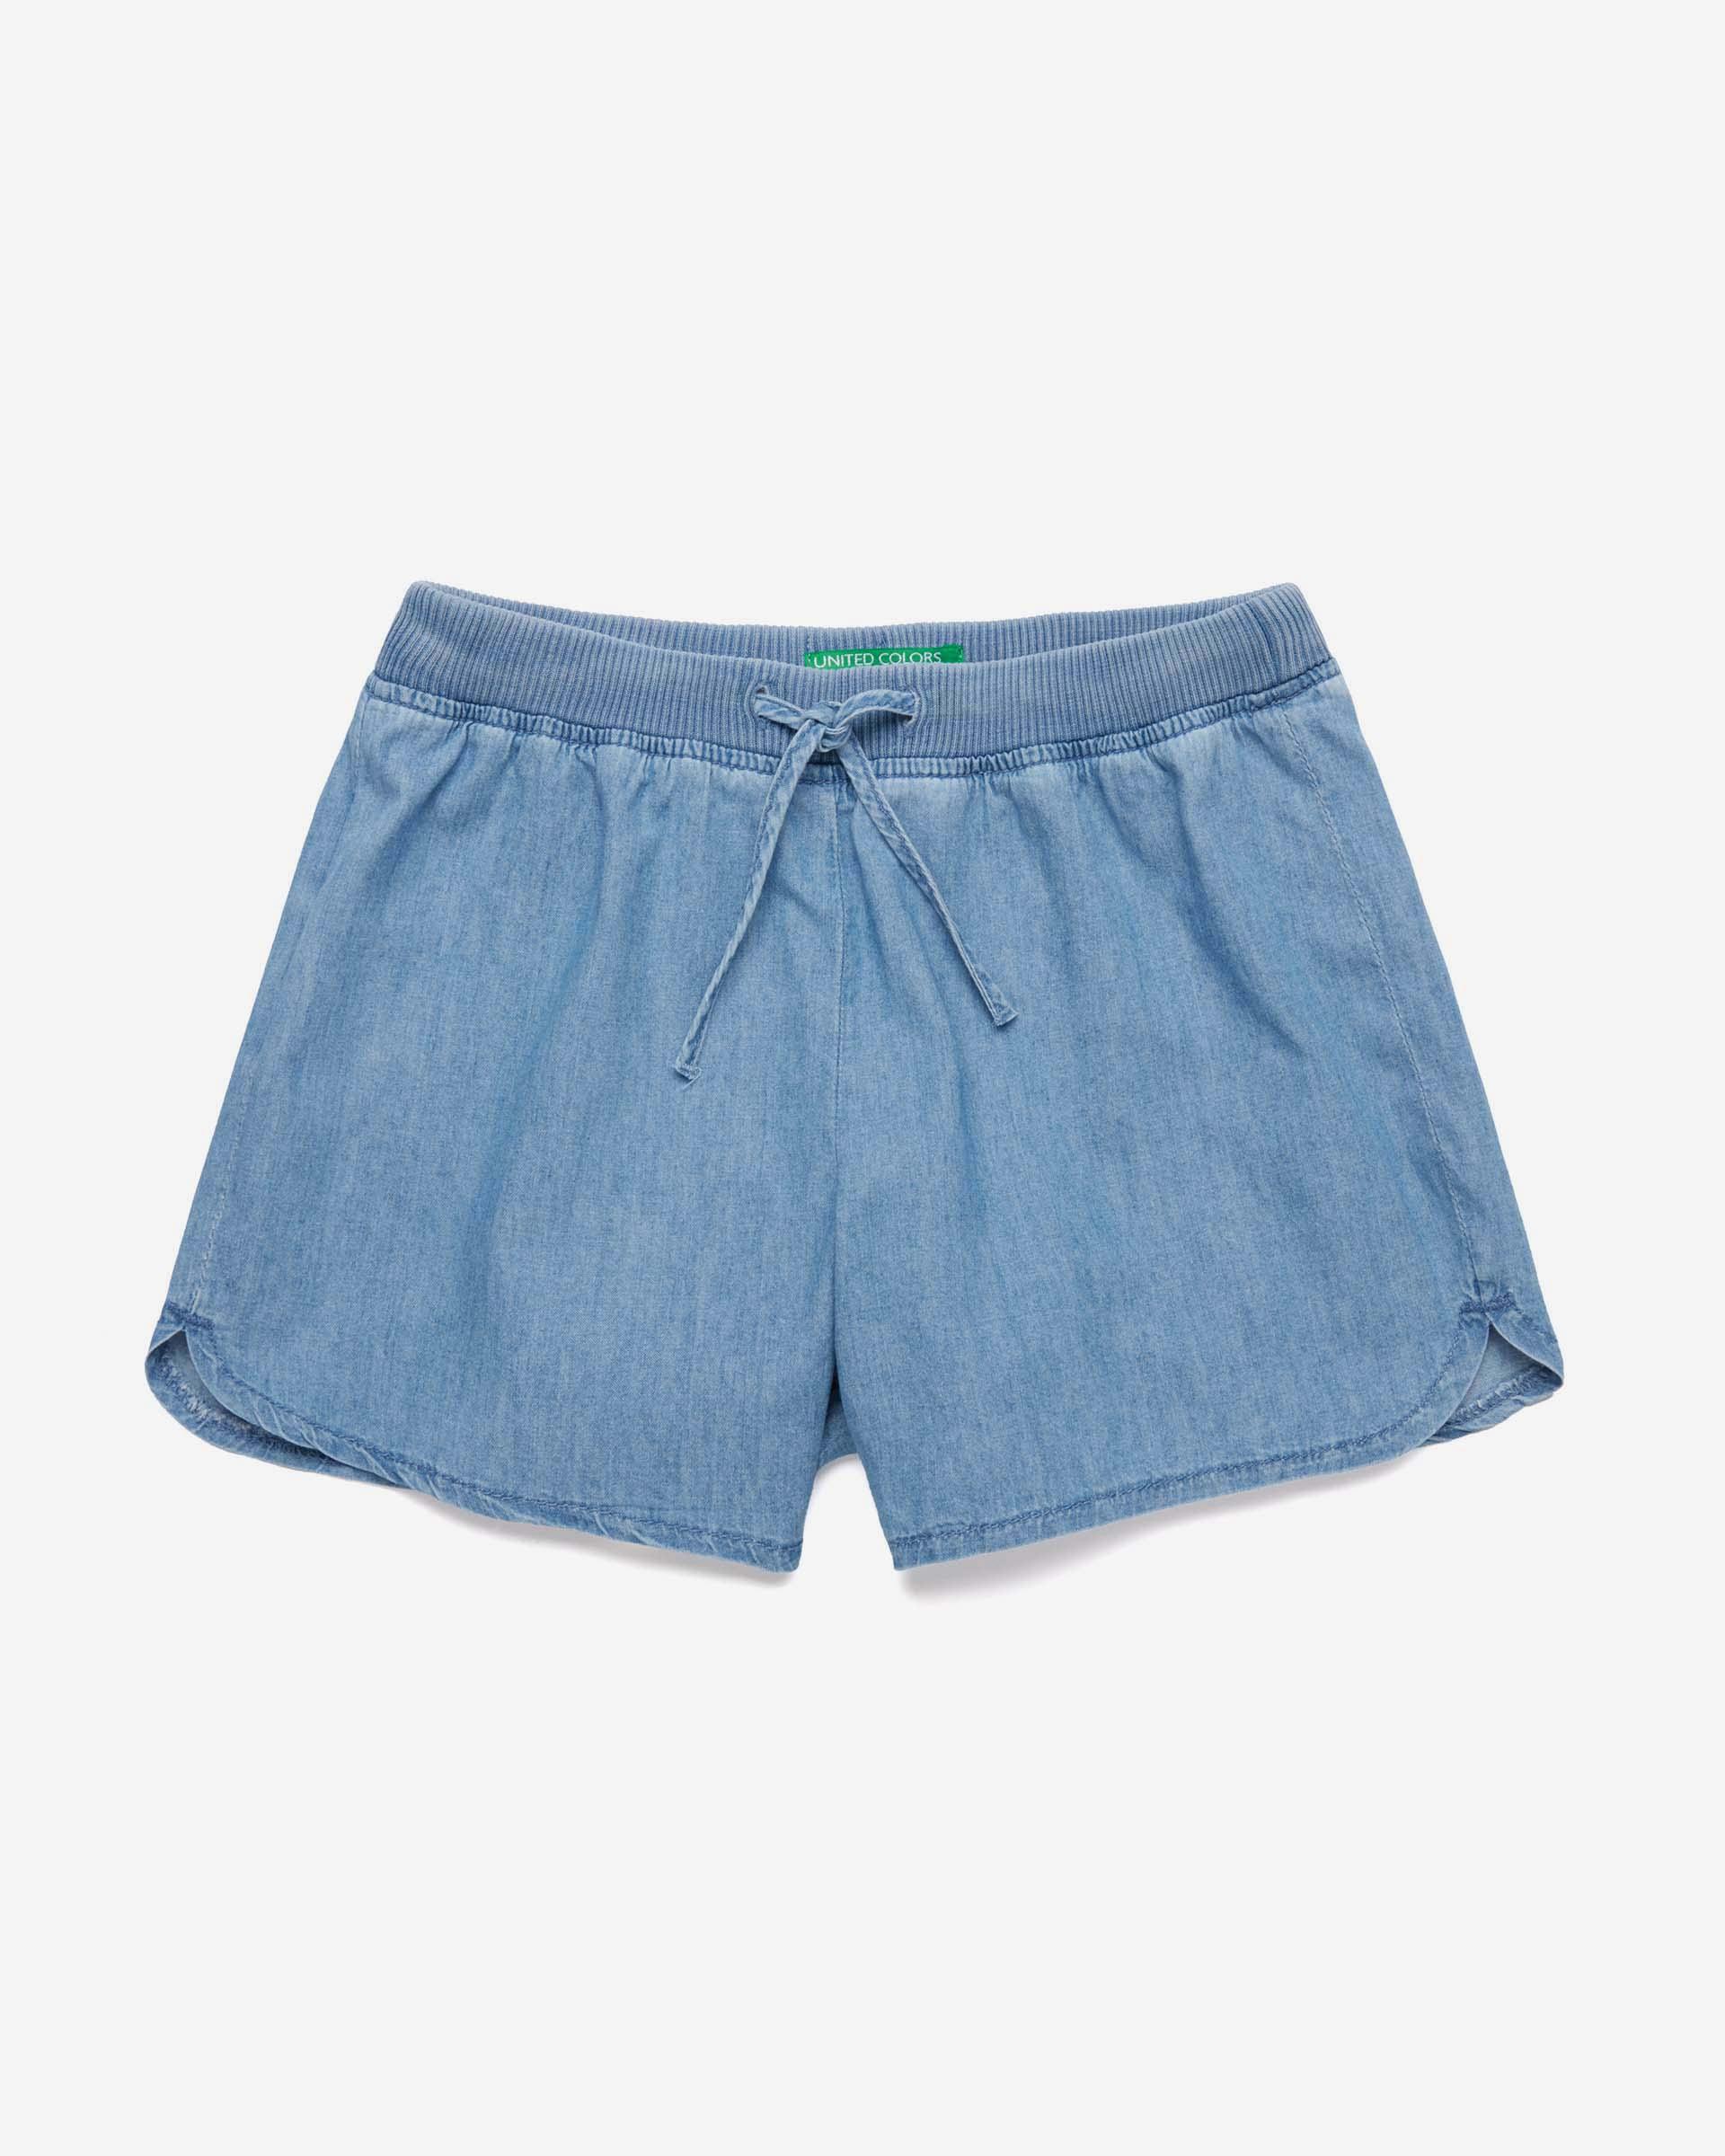 Купить 20P_4DHJ59E30_902, Шорты для девочек Benetton 4DHJ59E30_902 р-р 152, United Colors of Benetton